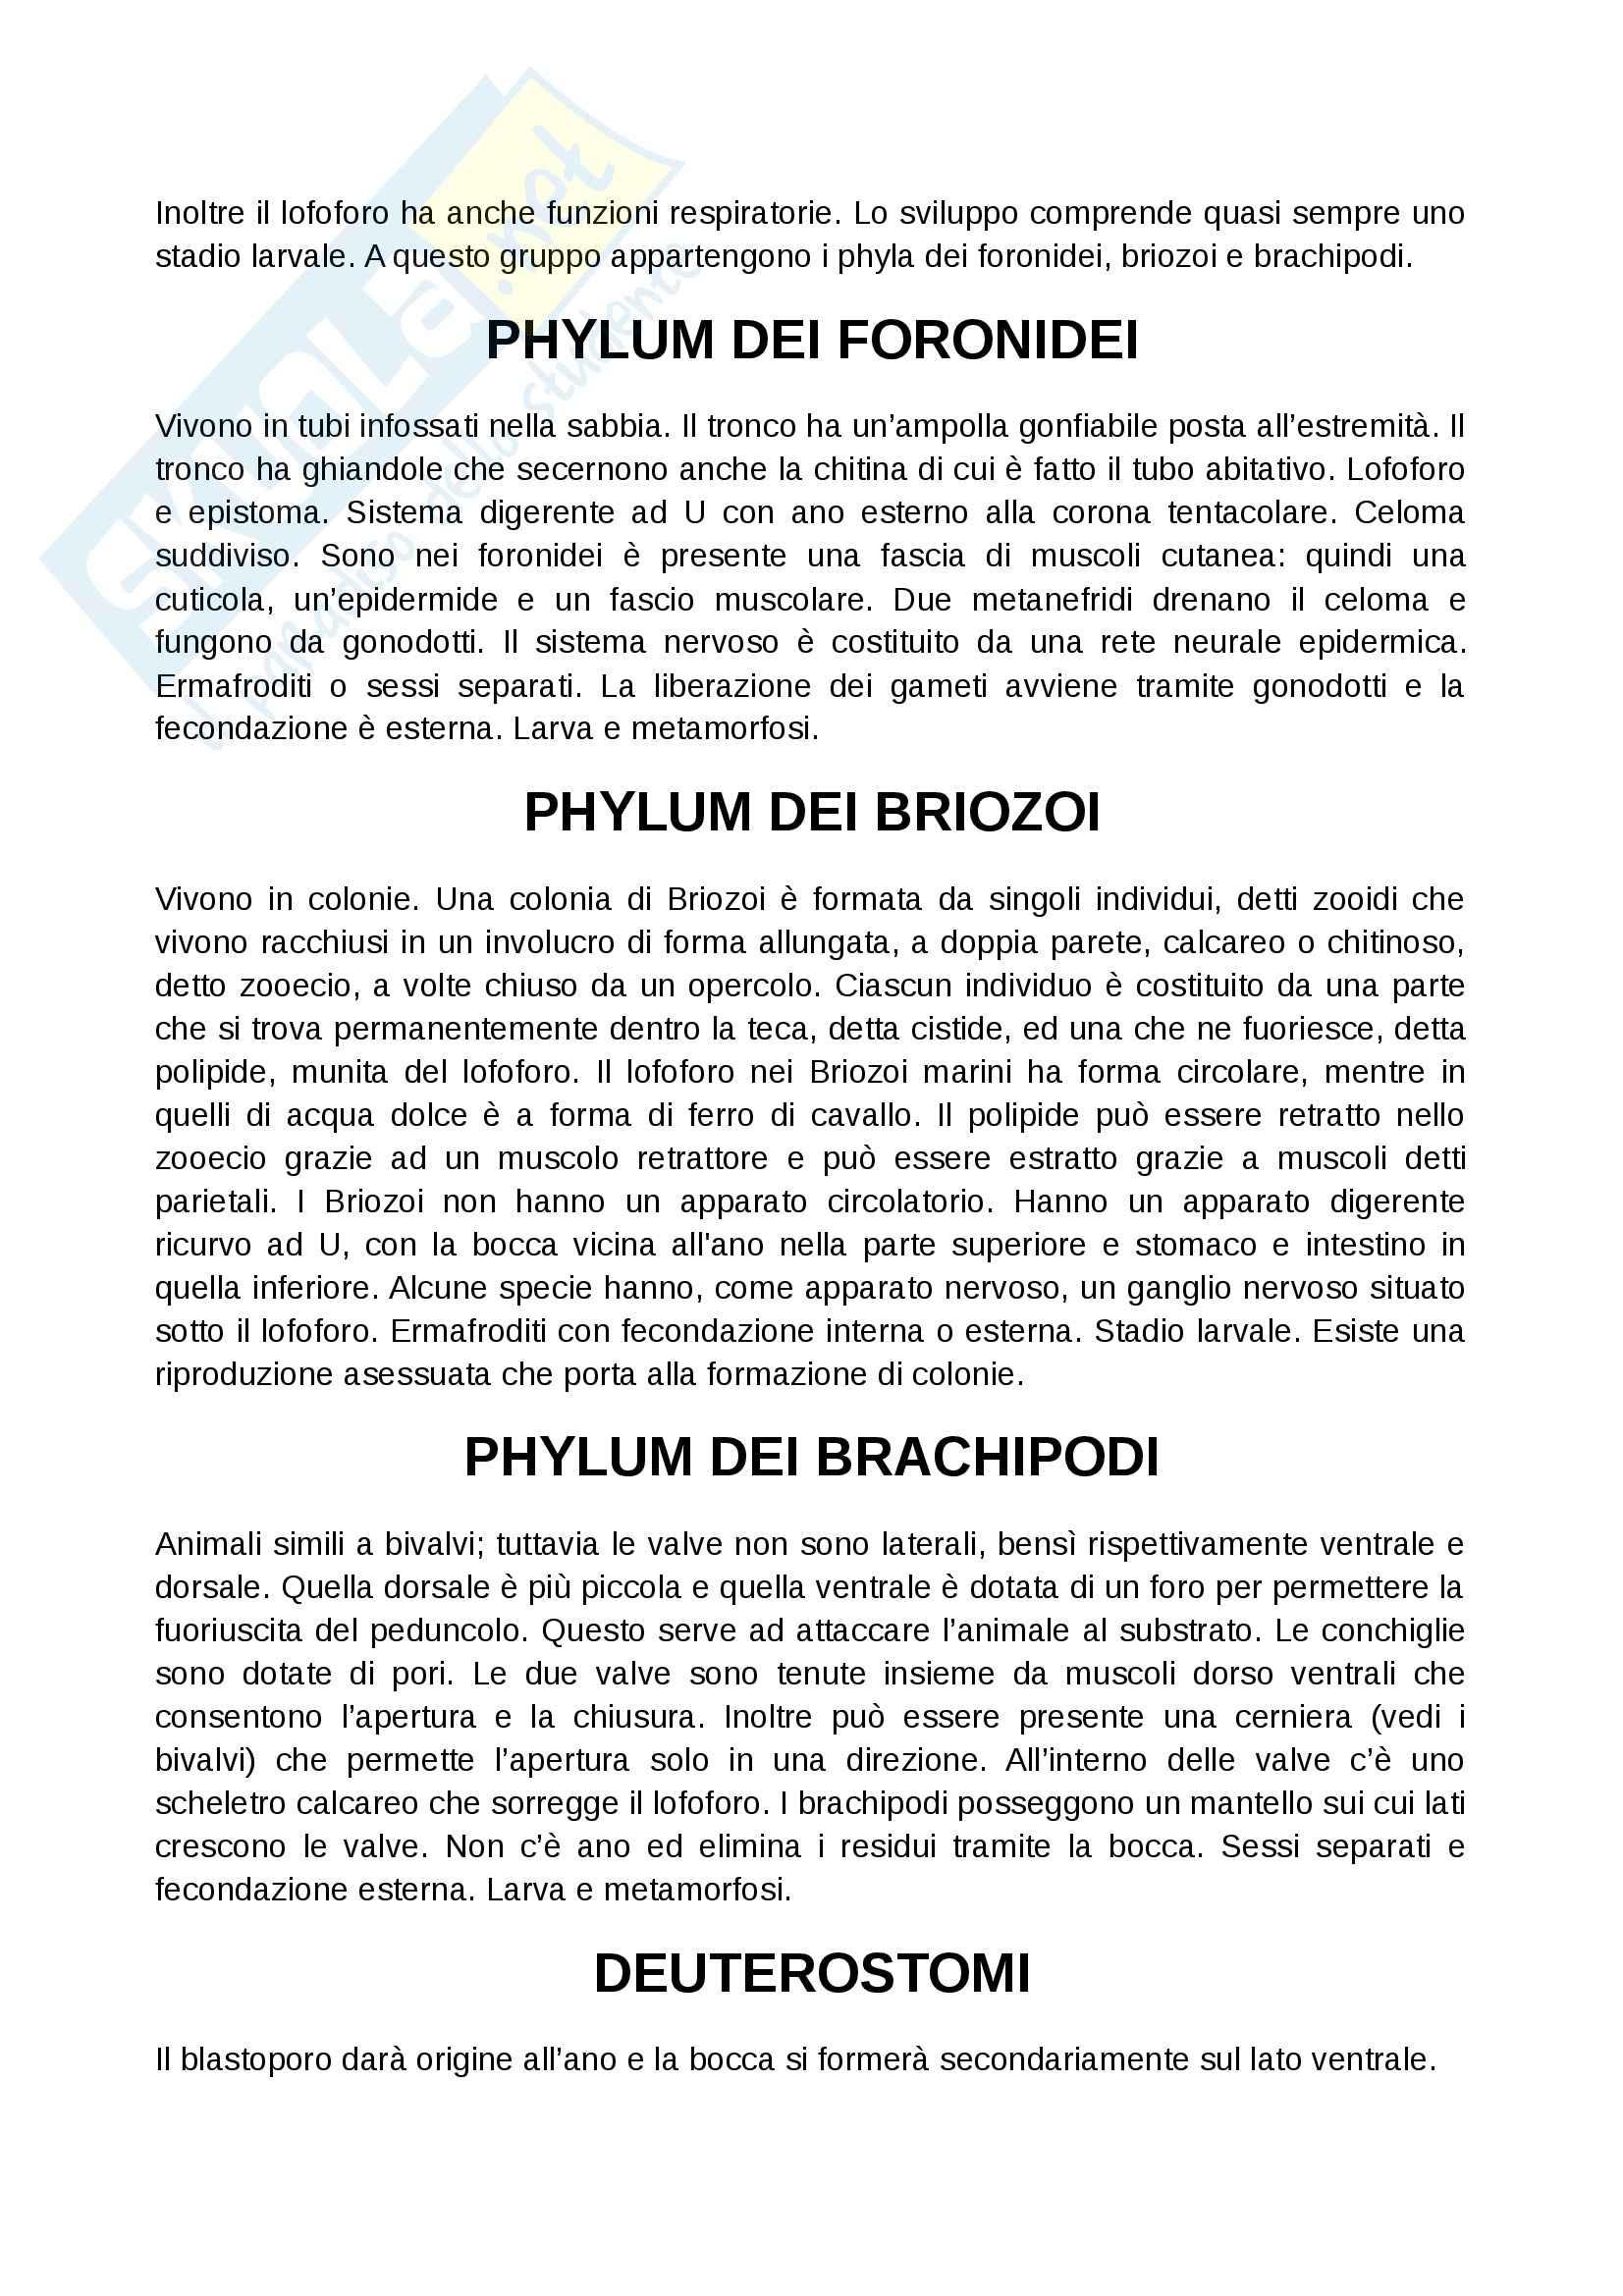 Zoologia  - Appunti Pag. 31